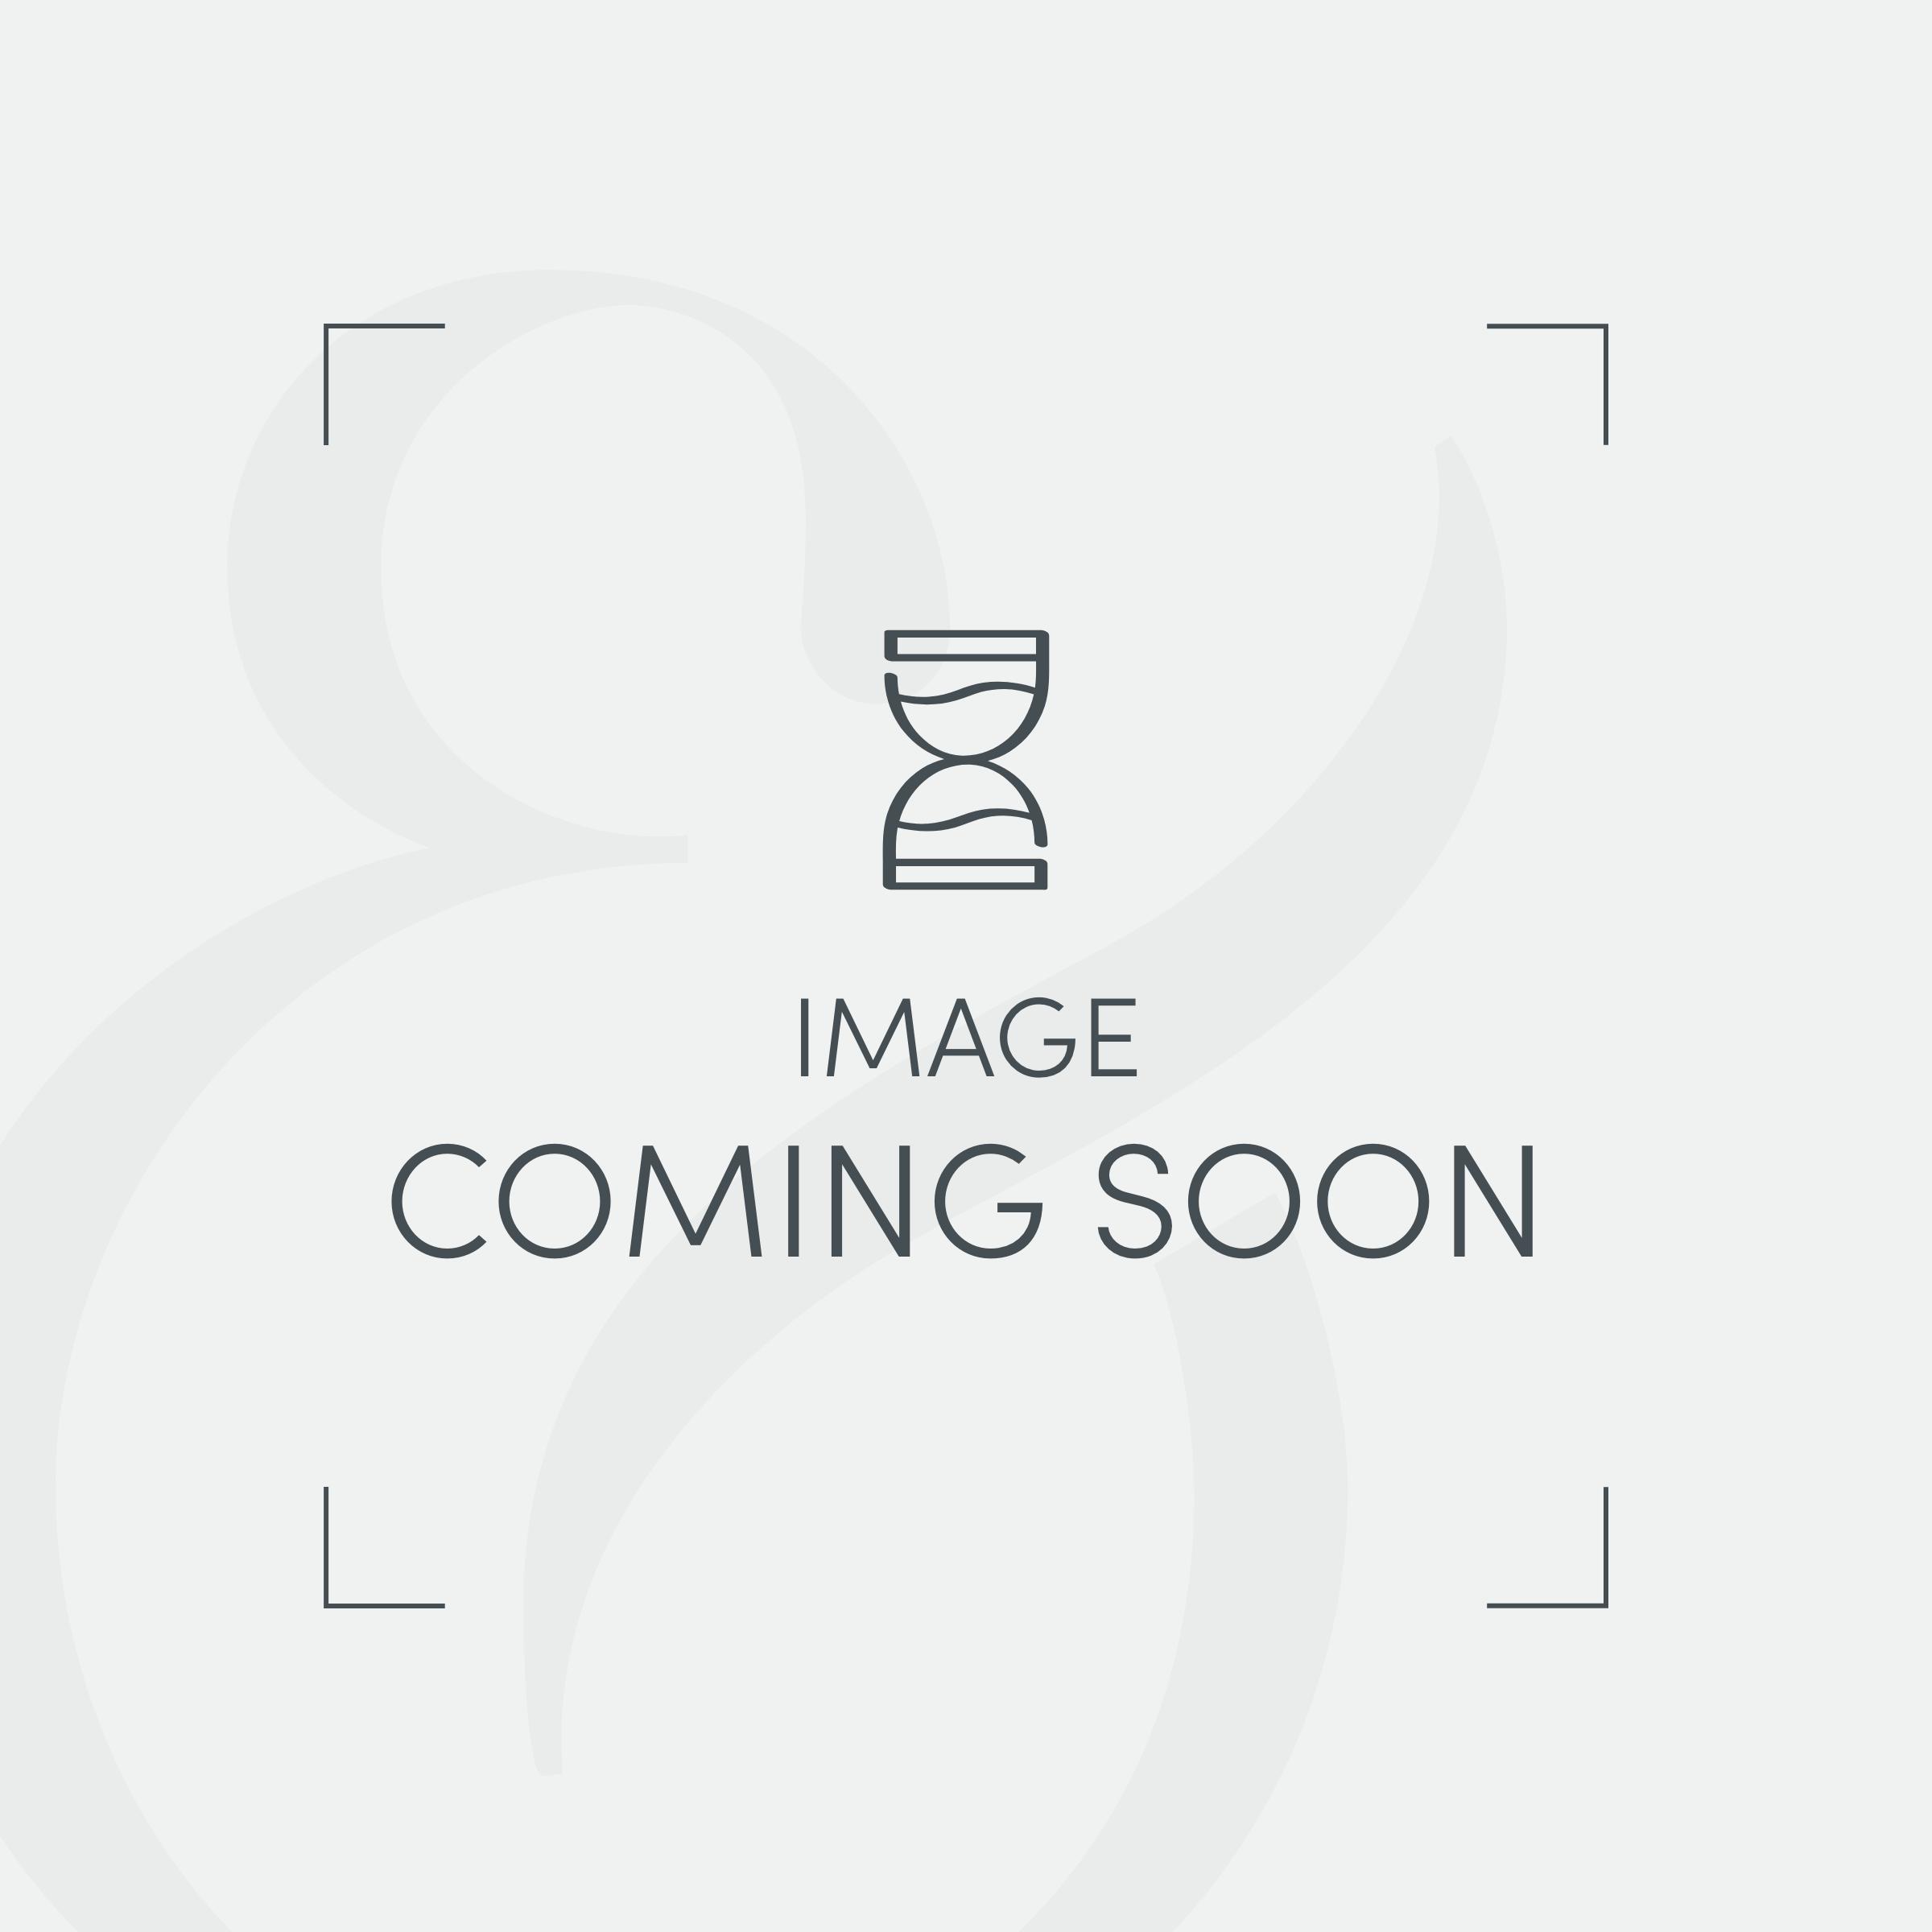 Luxury Egyptian Cotton Towel Bale Bundle - 2 x Hand Towels, 2 x Bath Towels - Nautical Blue